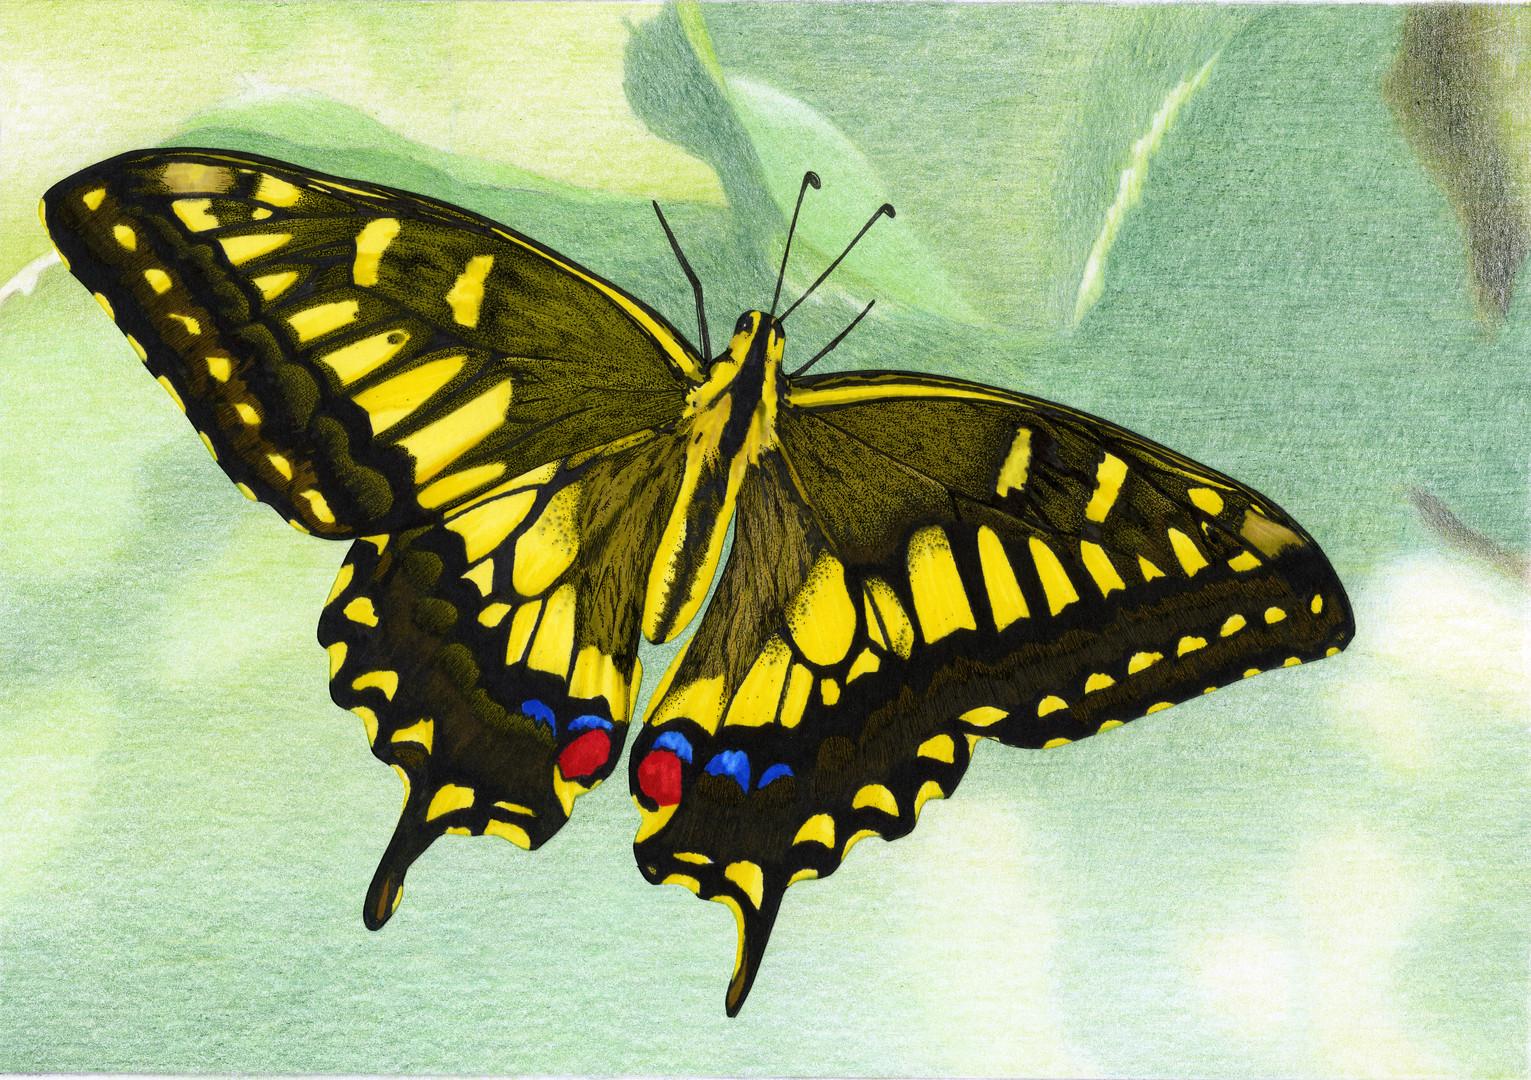 Swallowtail Butterfly illustration